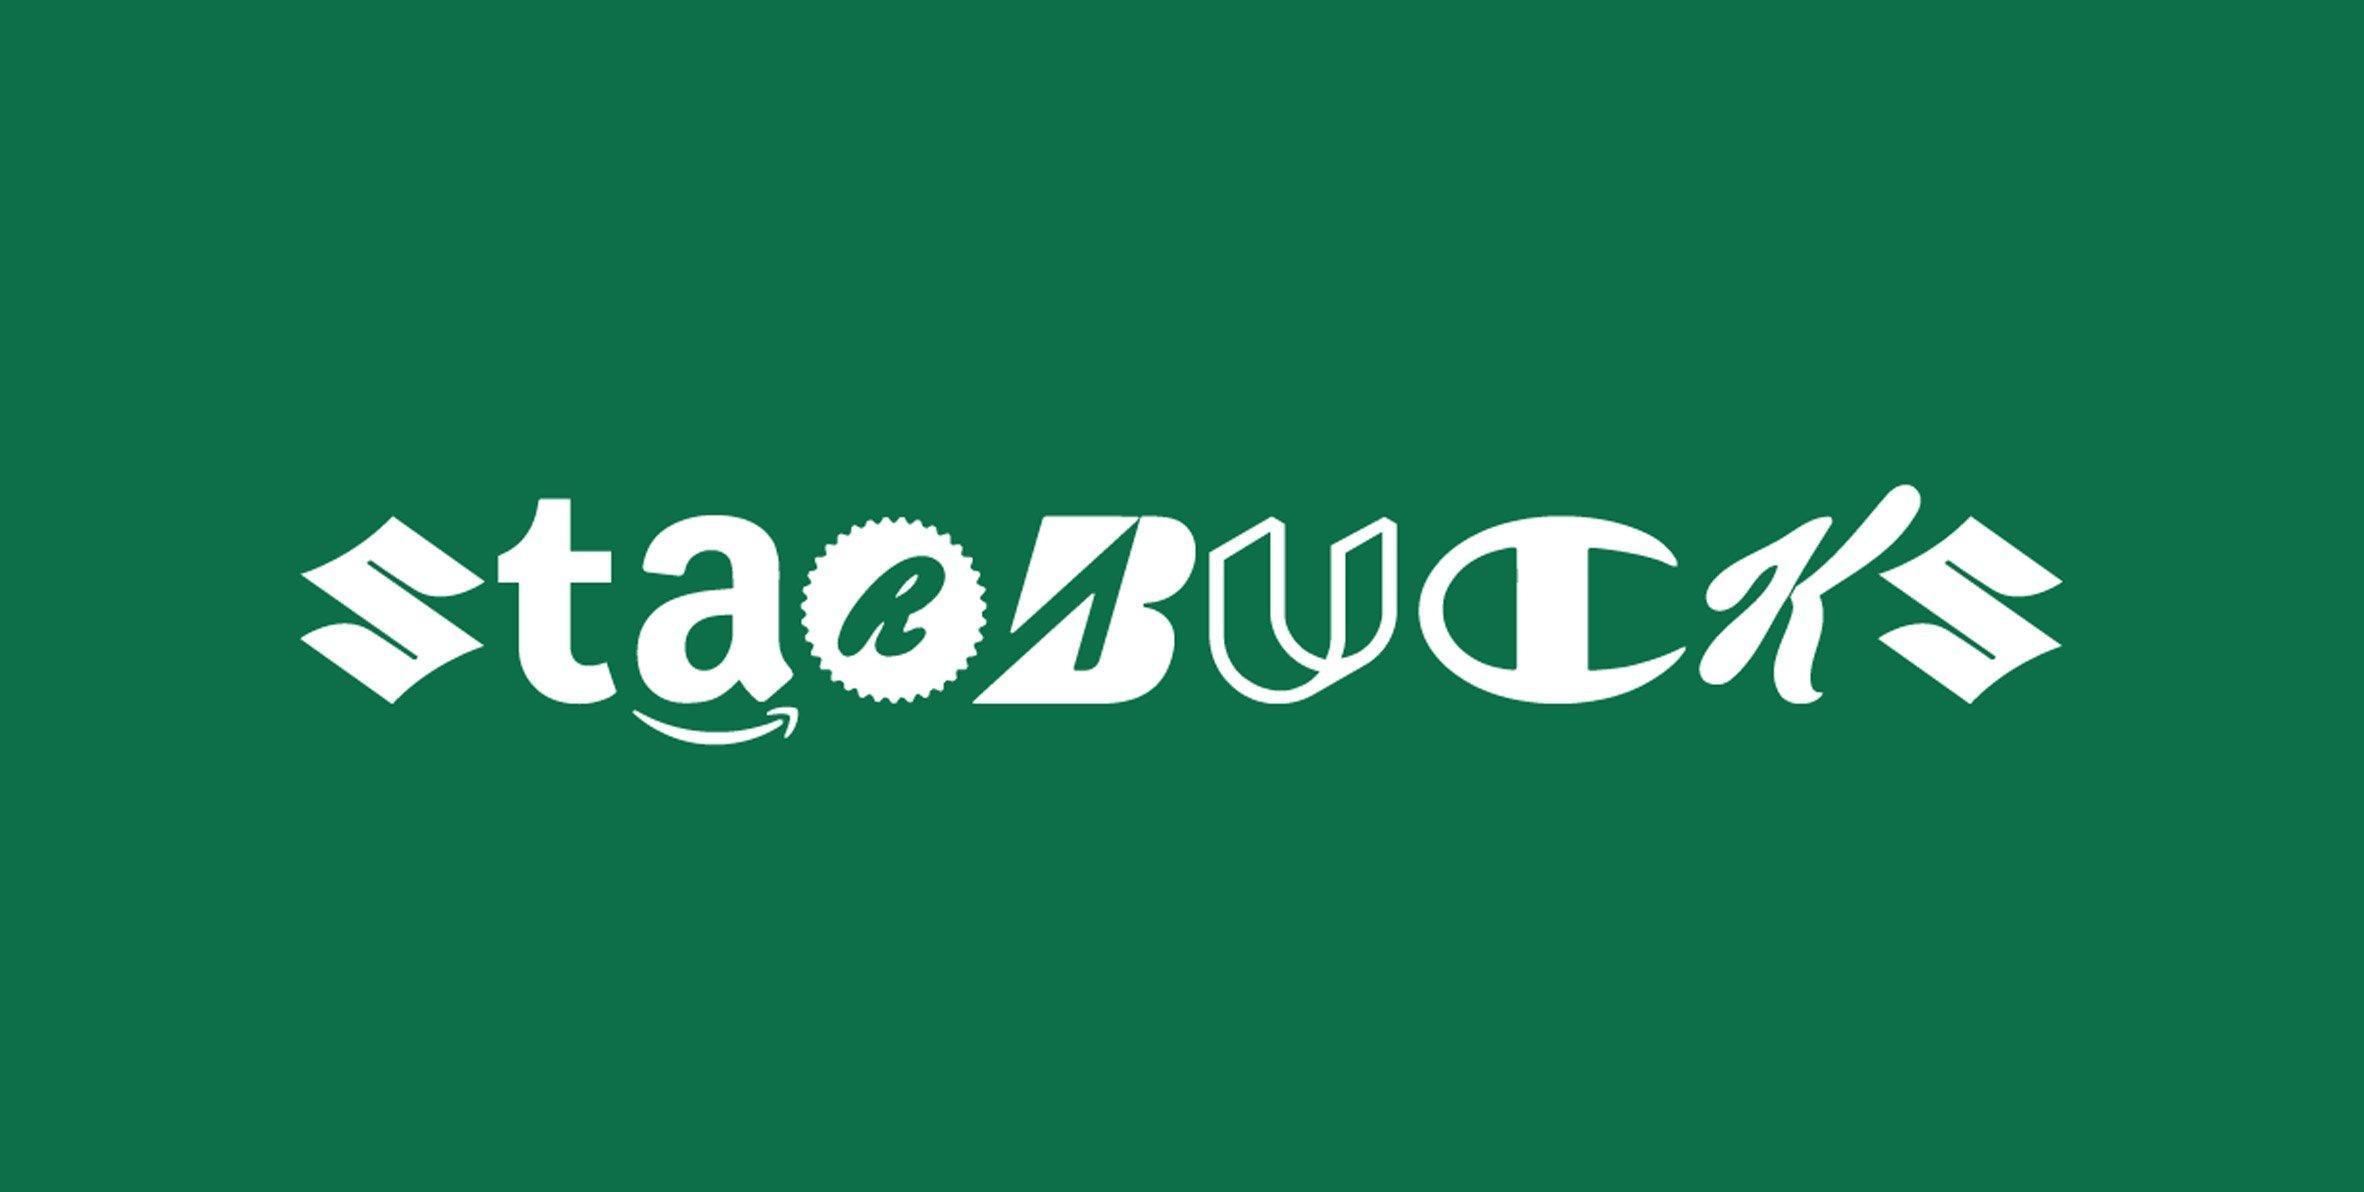 Brand New Roman Font Logo Starbucks